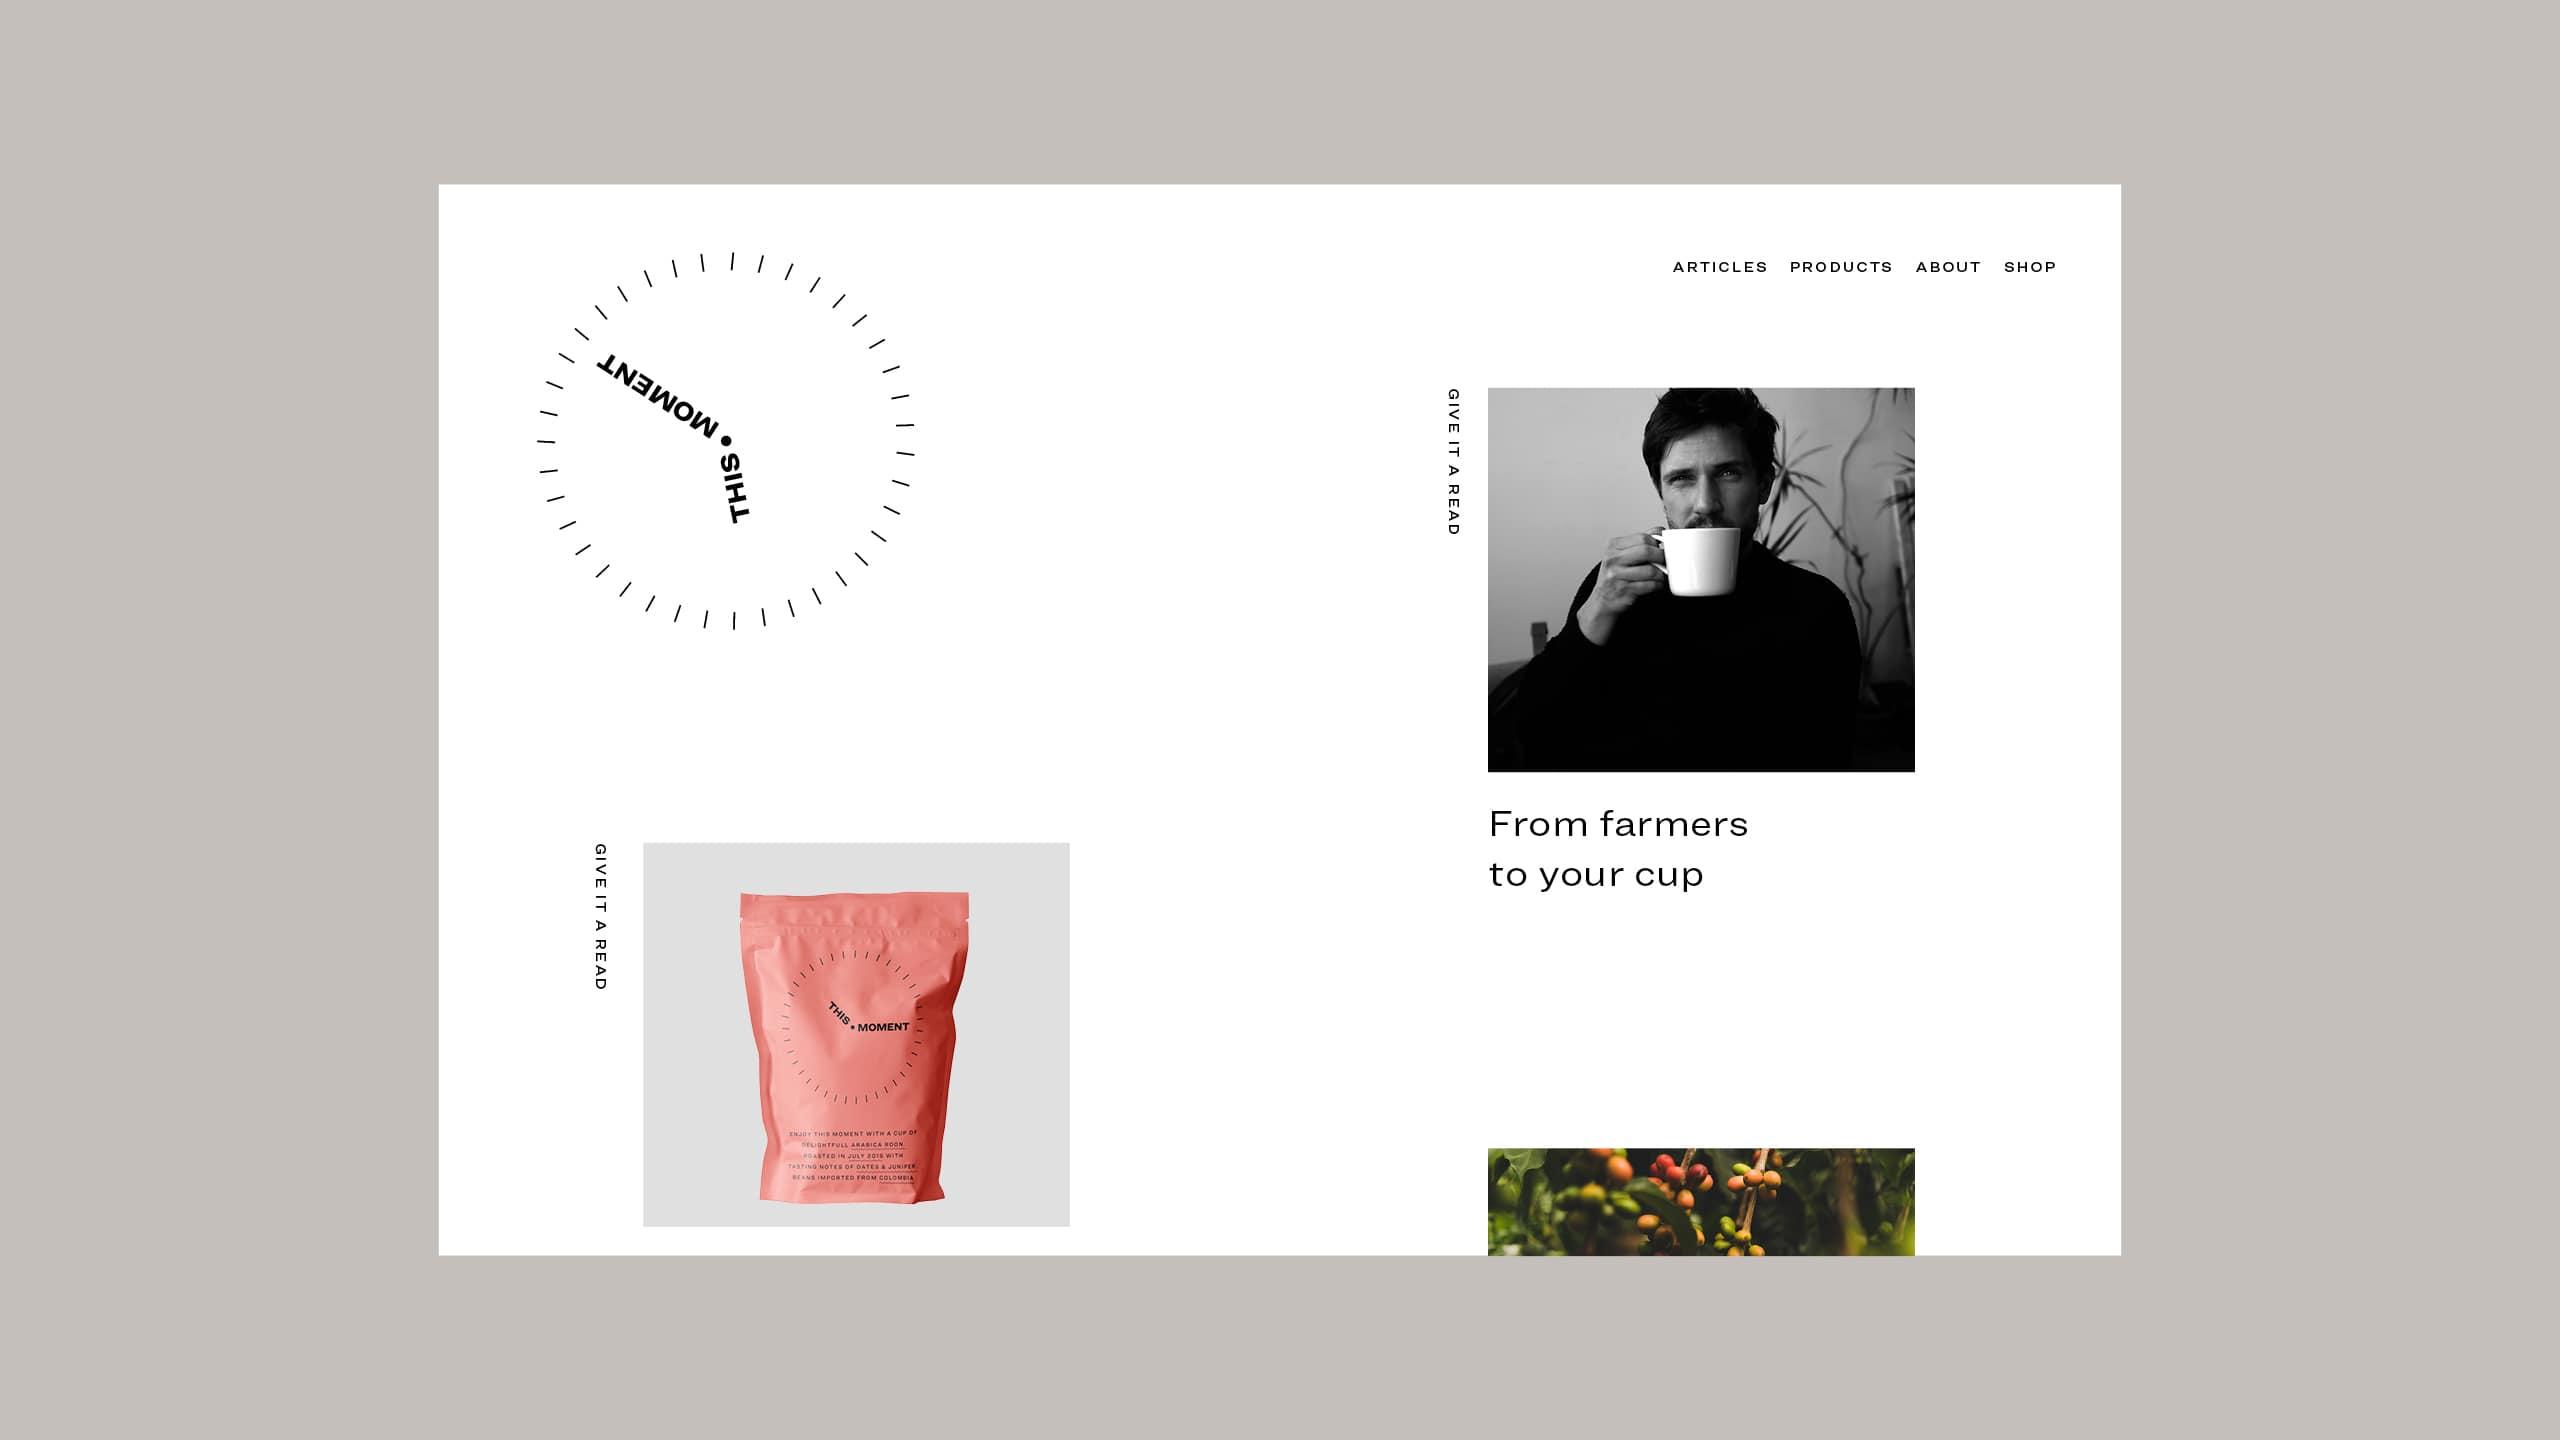 mantik-digital-branding-development-agency-creative-app-ui-web-branding-16-min-2